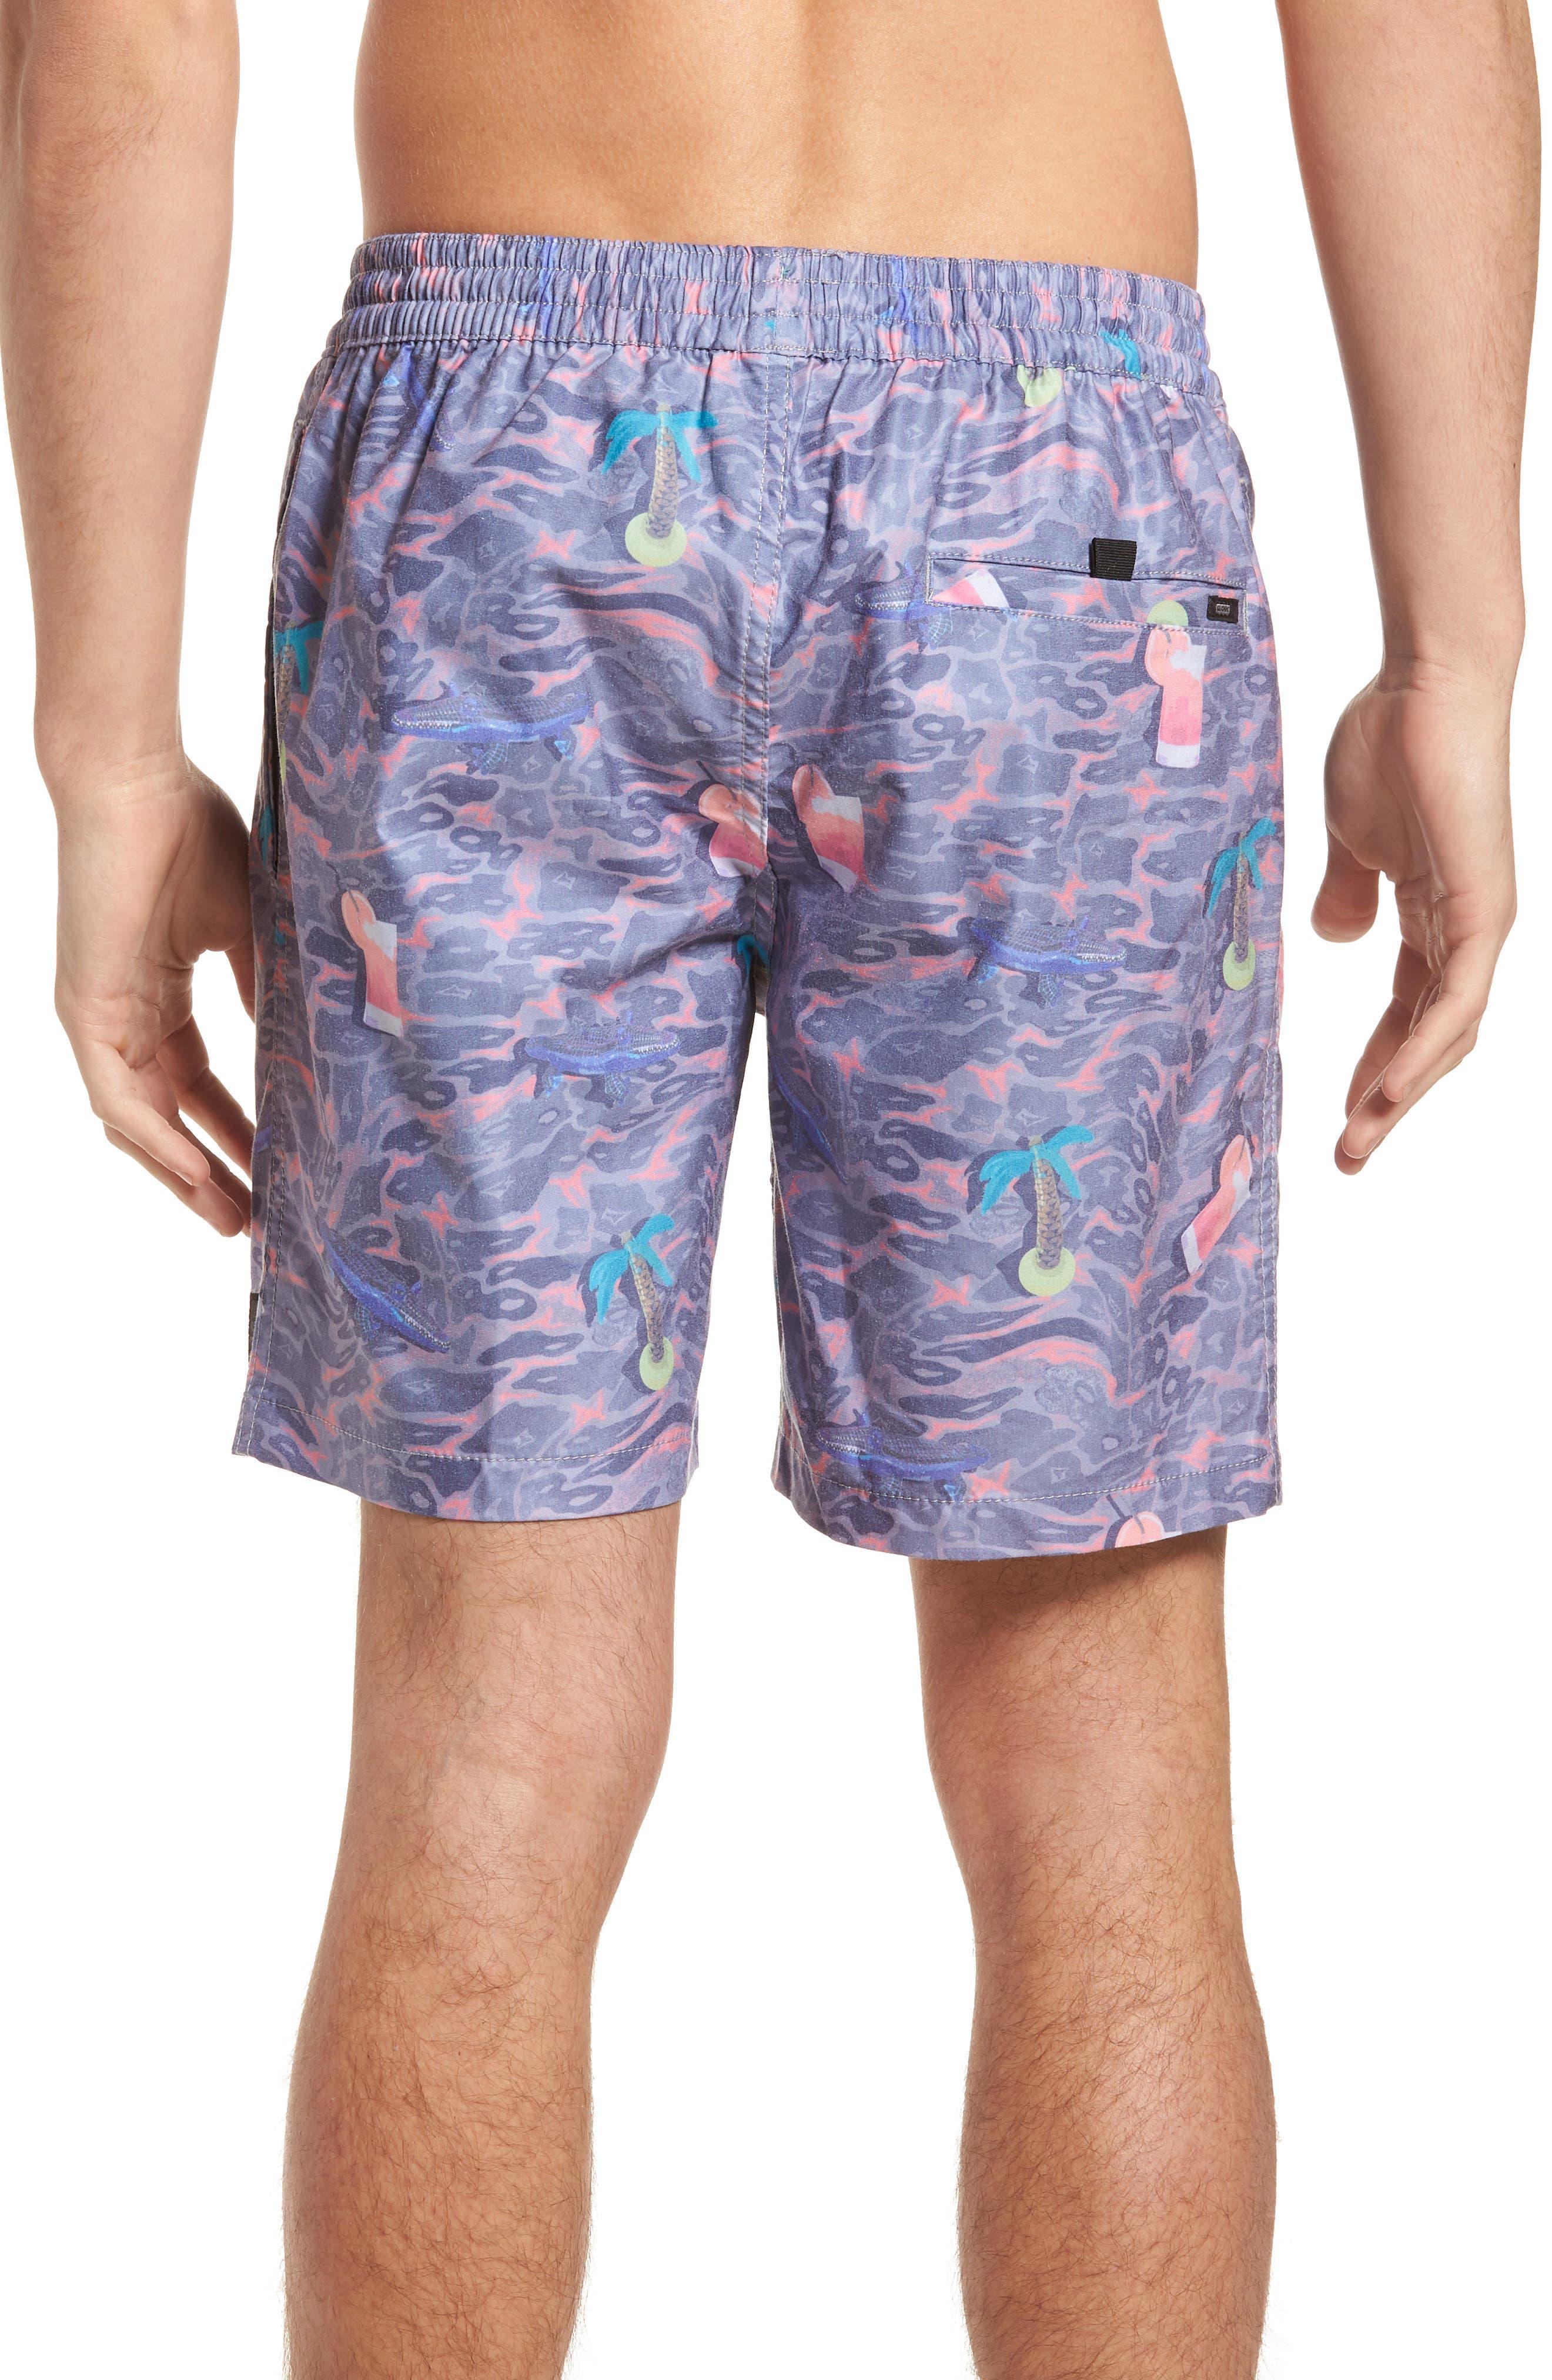 Deep End Pool Shorts,                             Alternate thumbnail 2, color,                             950